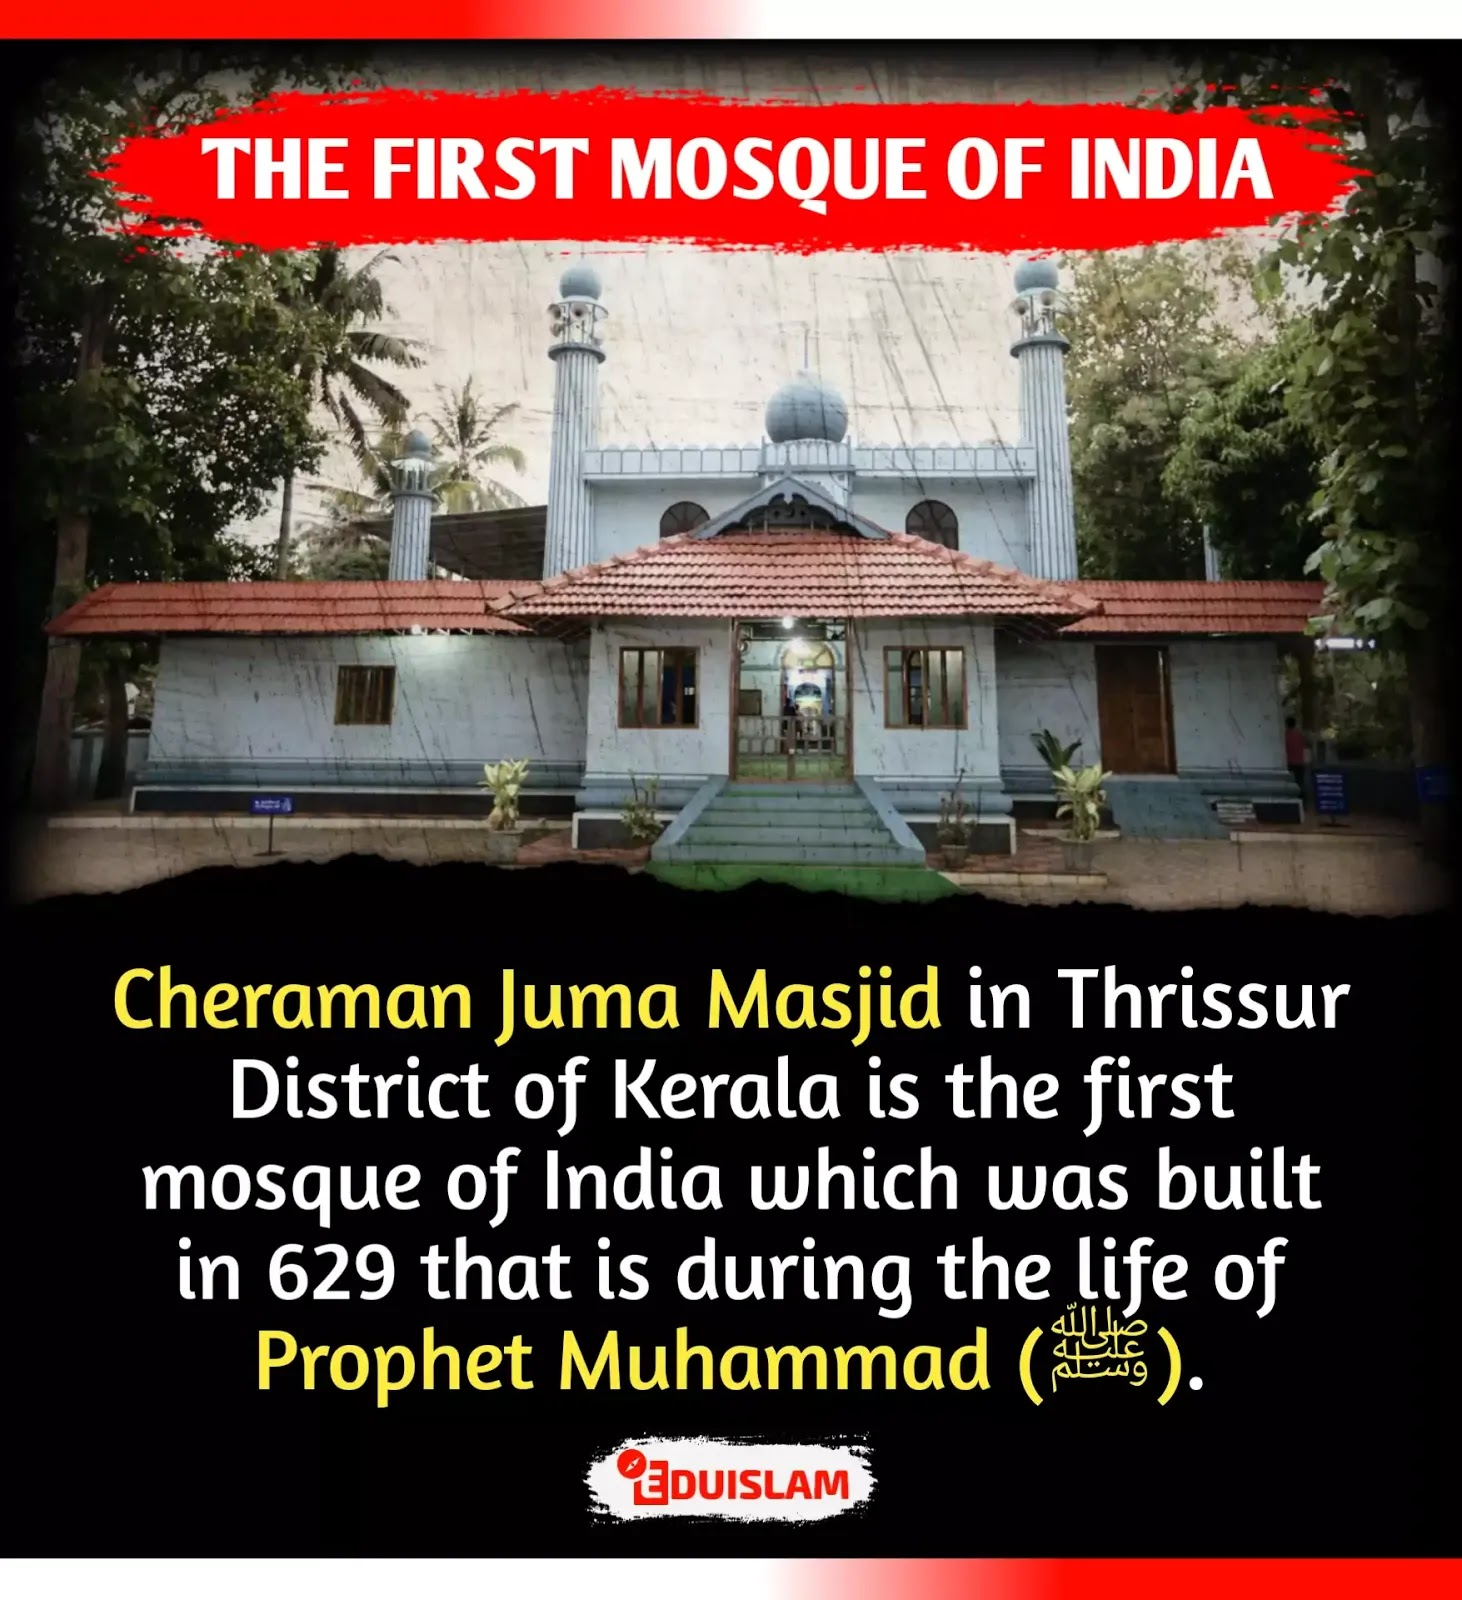 India's First Mosque Cheraman Juma Masjid